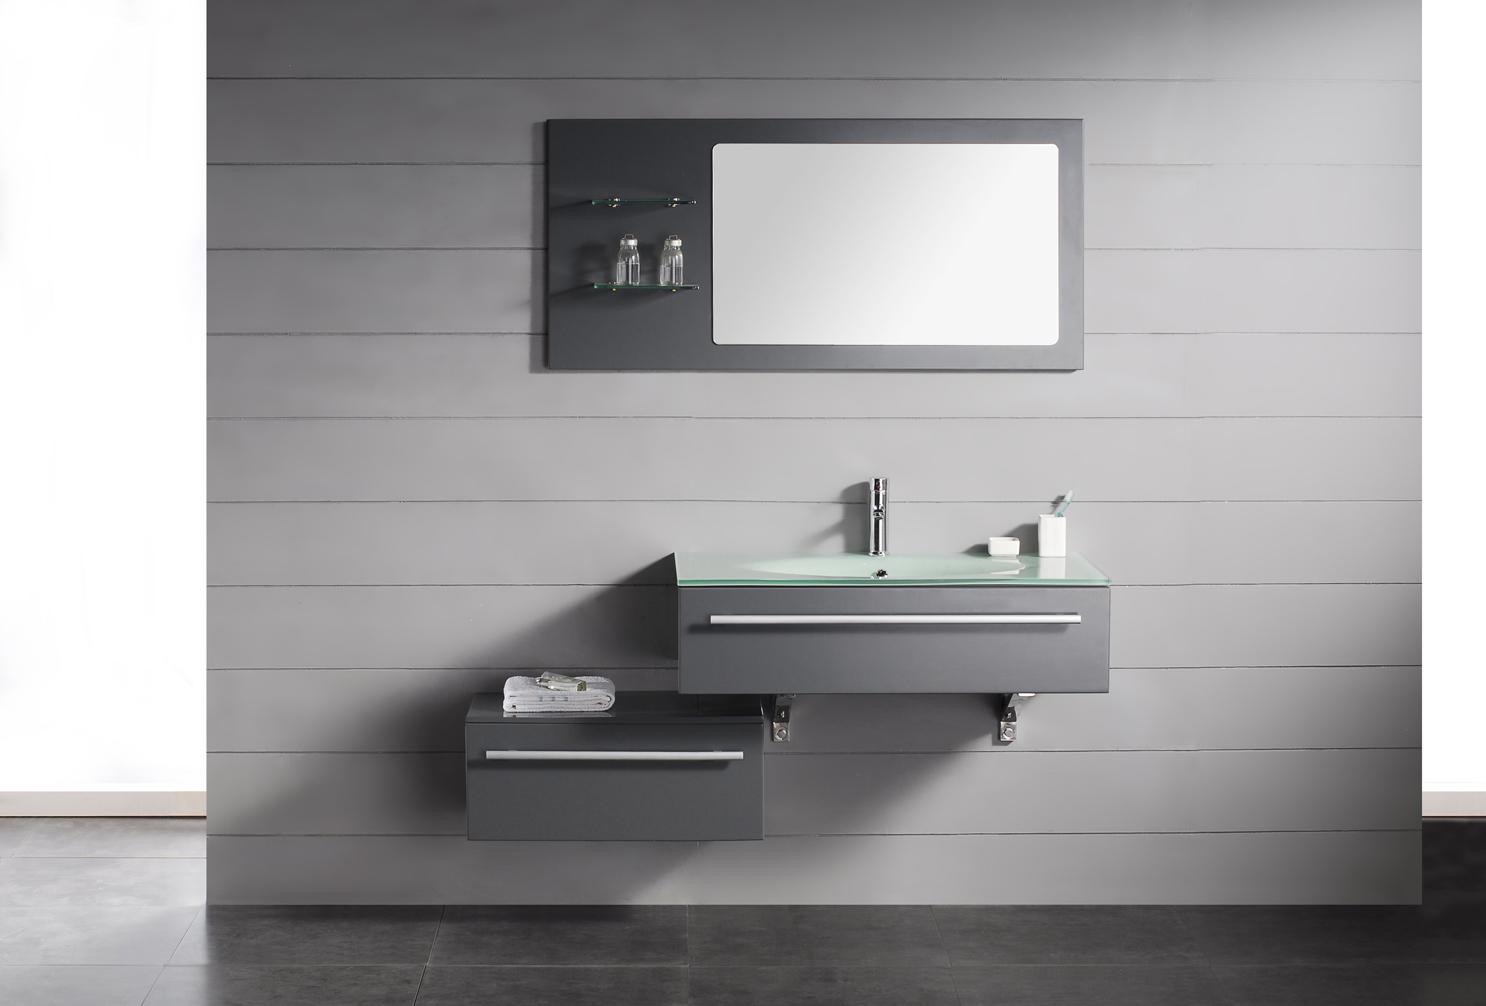 Modern-Bathroom-Vanities-Design-with-Wall-Mirror